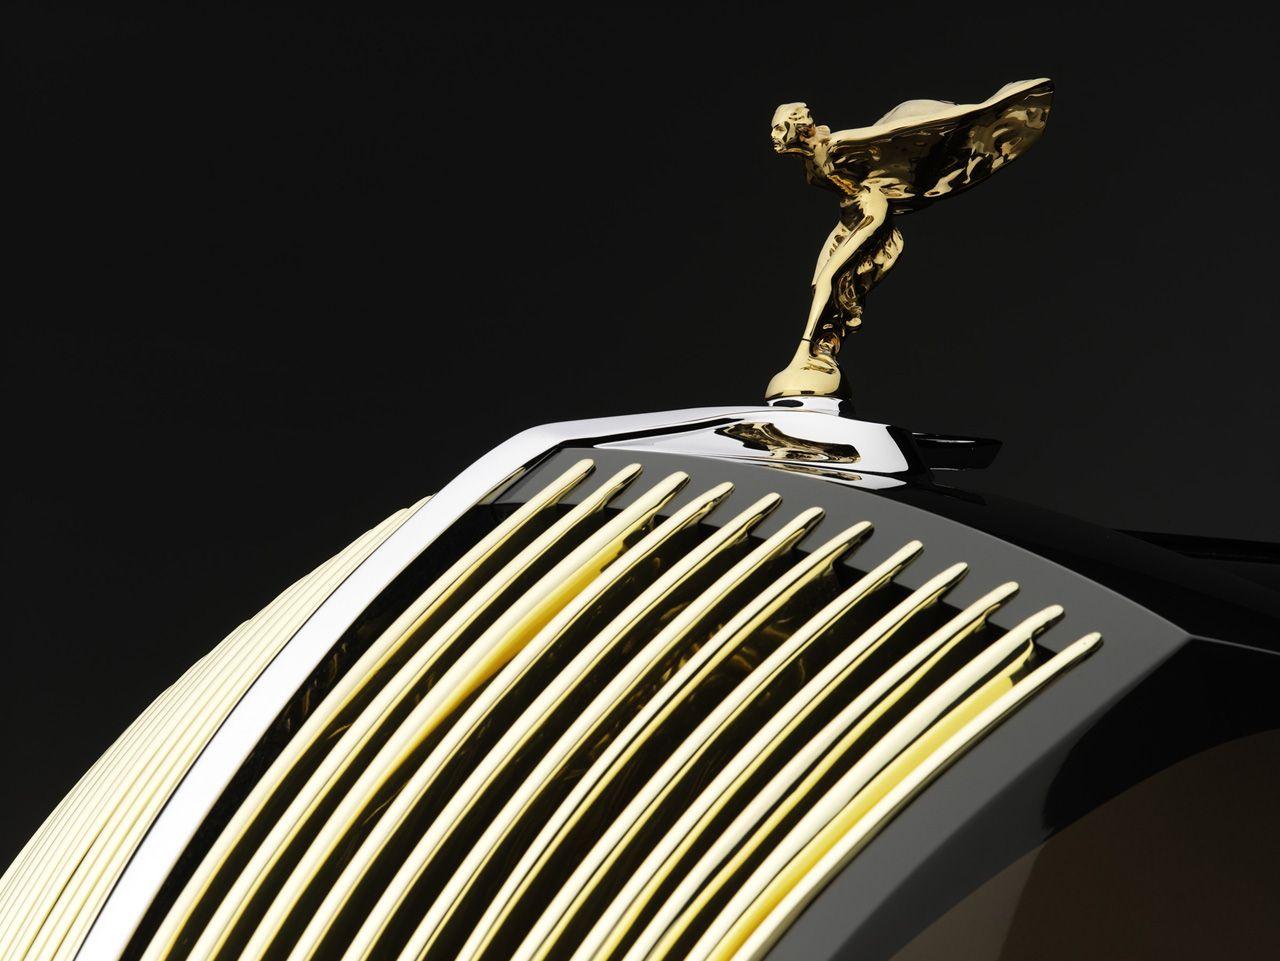 1939 47 Rolls Royce Phantom Iii Vutotal Cabriolet Rolls Royce